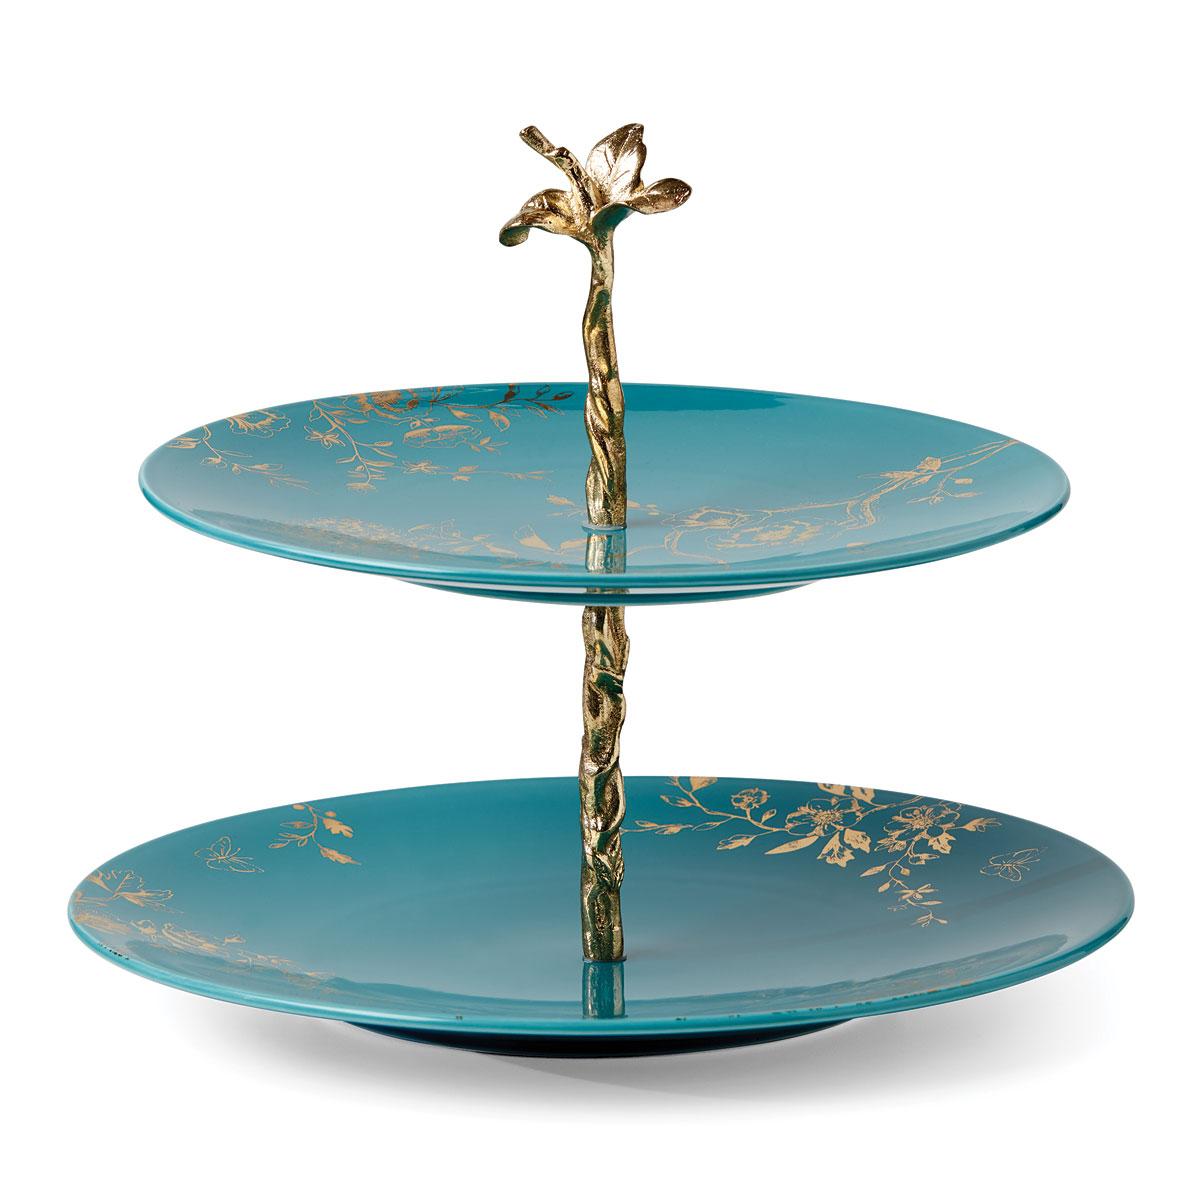 Lenox Sprig And Vine Dinnerware Tiered Server Turquoise